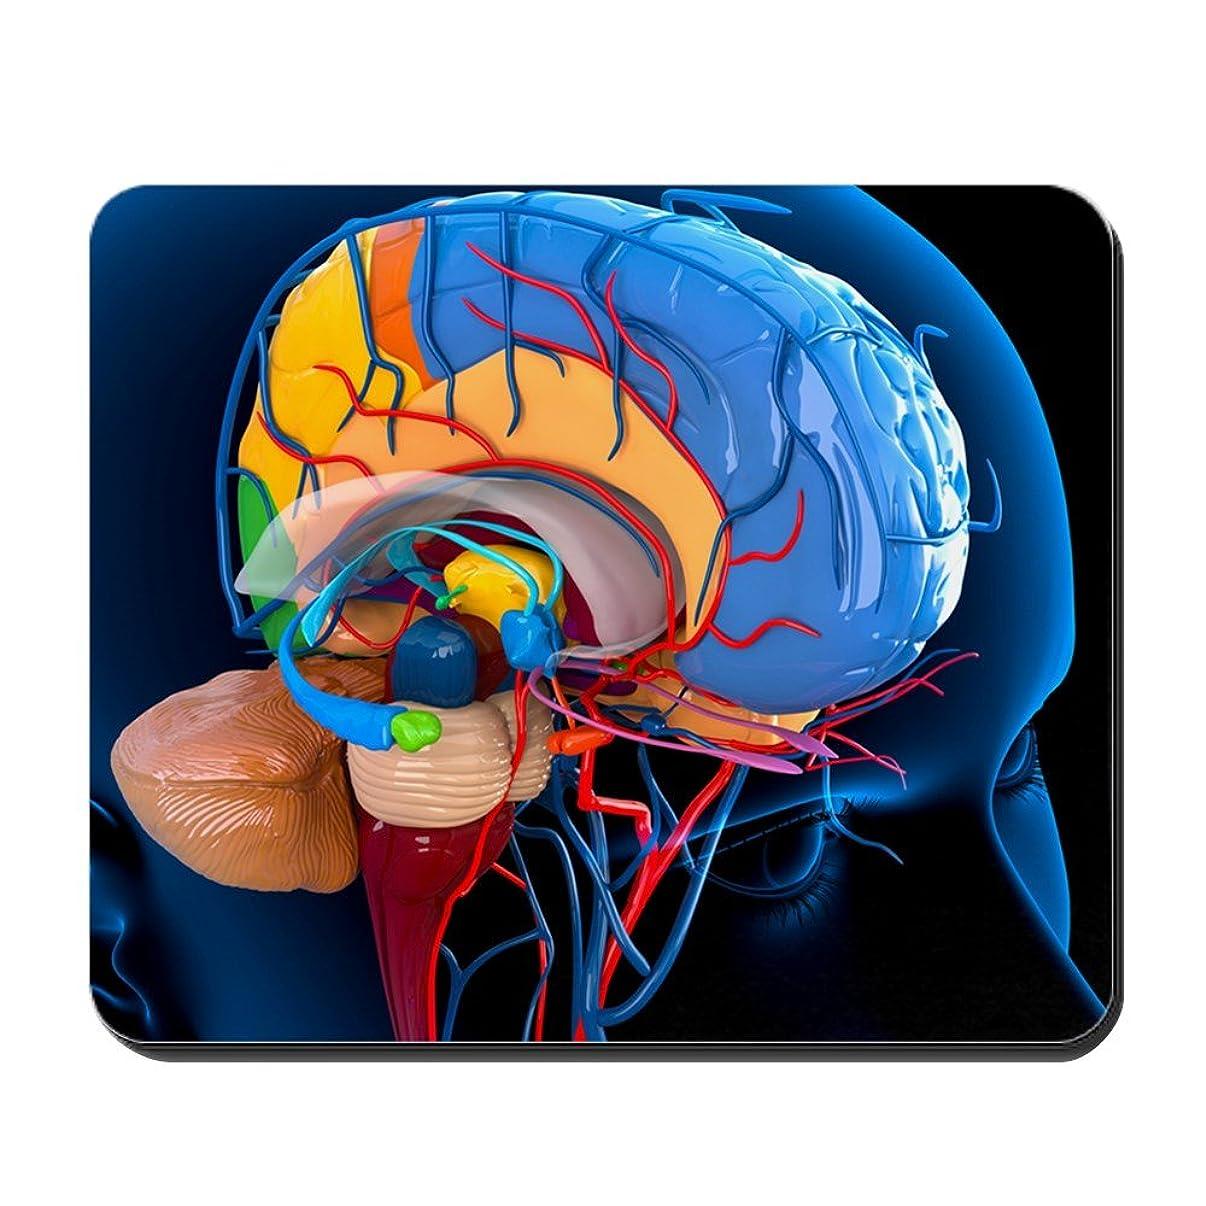 CafePress - Human Brain Anatomy, Artwork - - Non-Slip Rubber Mousepad, Gaming Mouse Pad